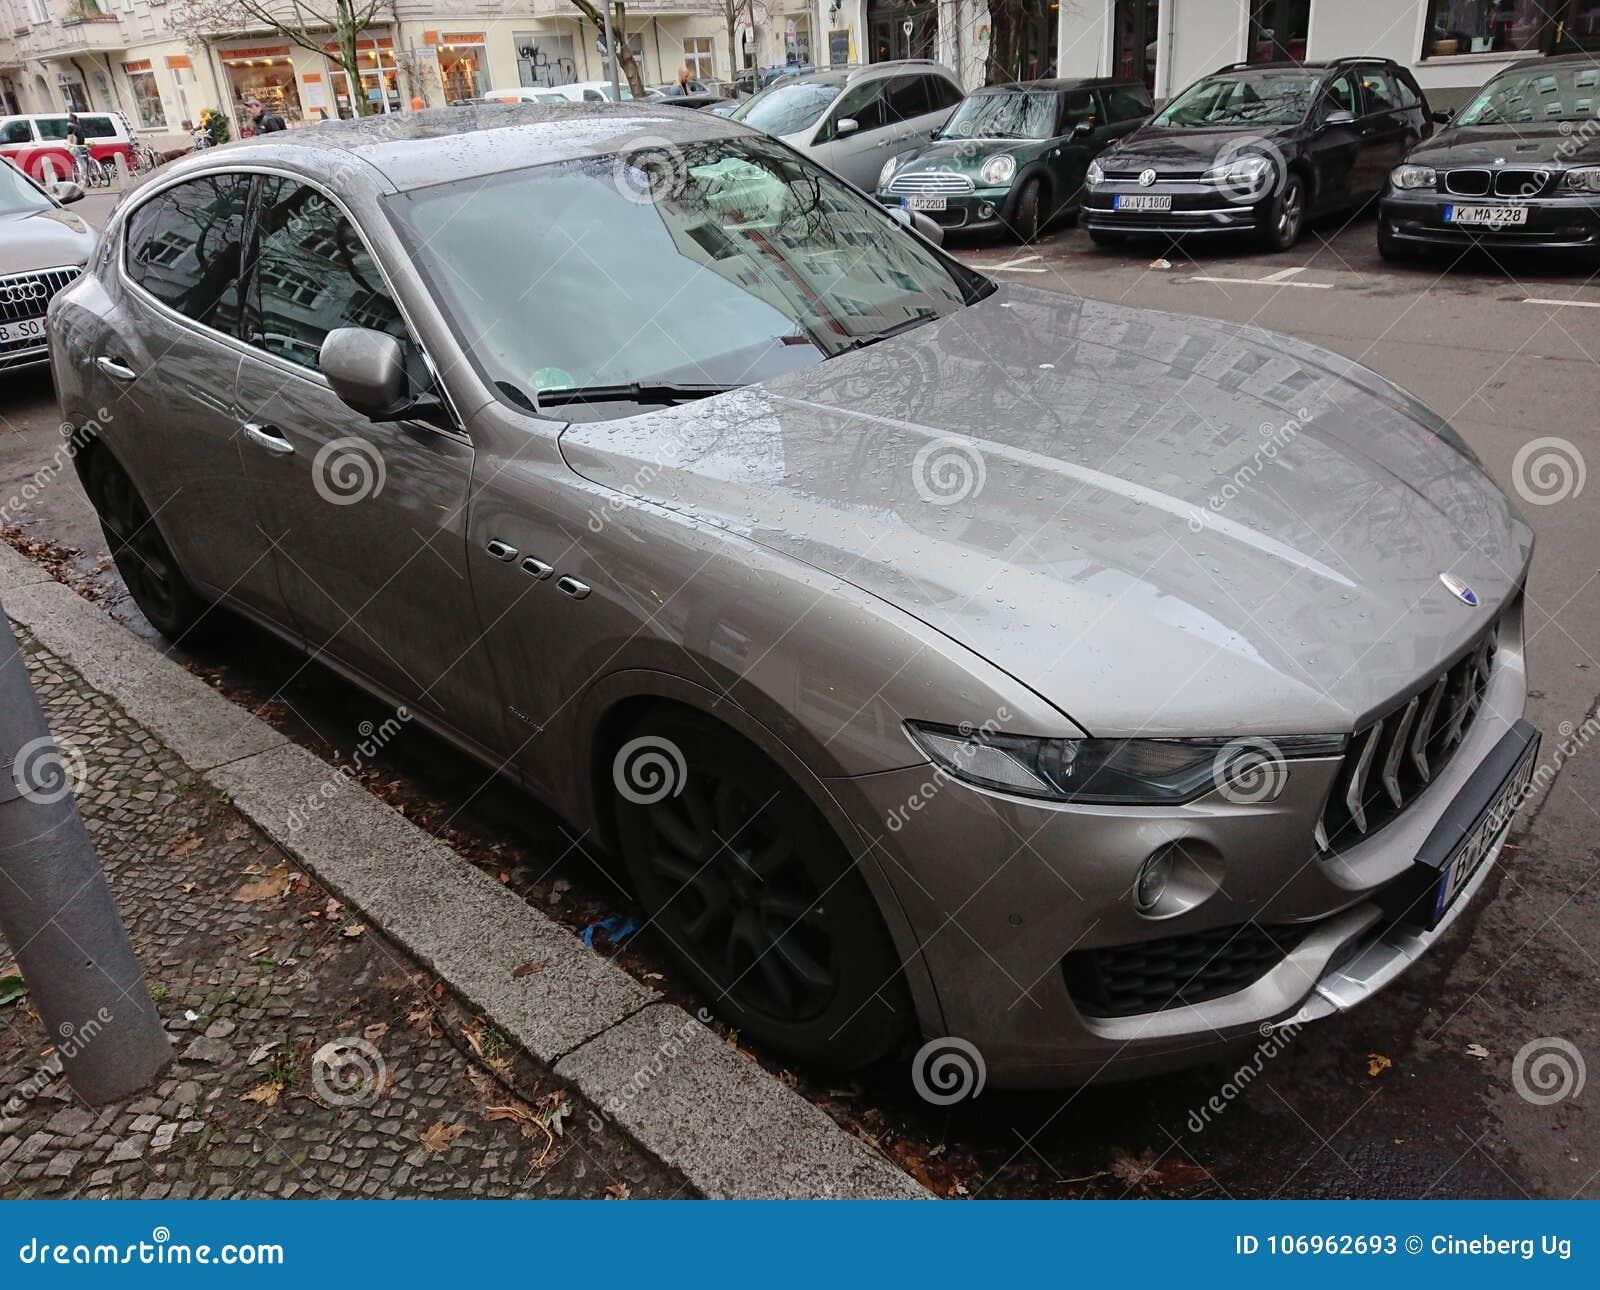 Trident Car Logo >> Grey Maserati Car With Trident Logo Editorial Stock Photo Image Of